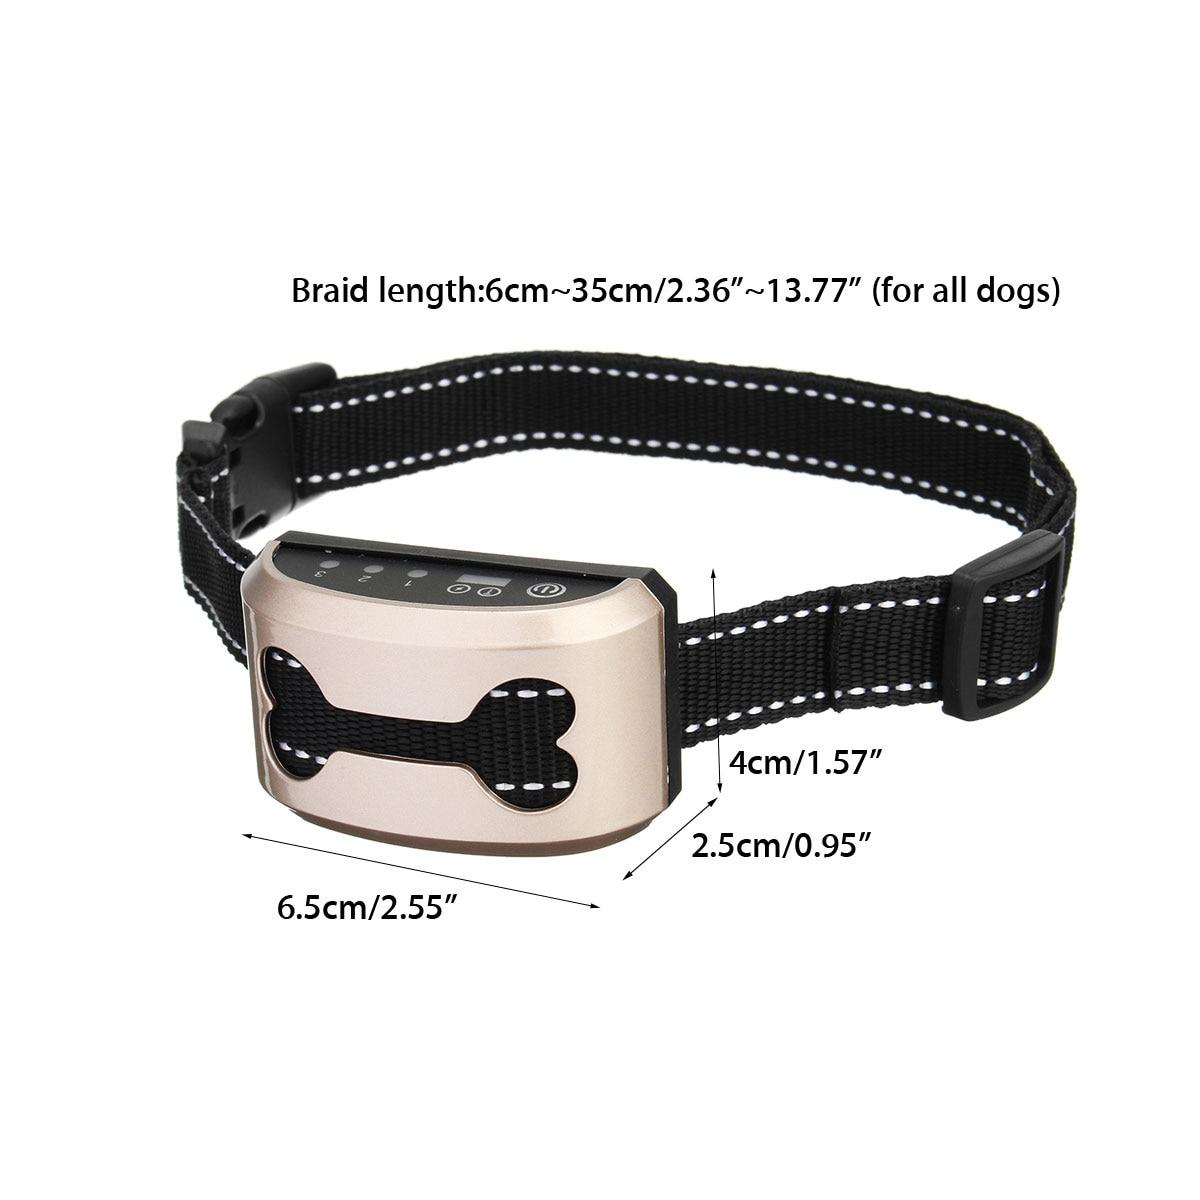 Electric Bark Control Collar for Dog Collar Anti Bark Dog Training Rechargeable Waterproof Shock Collar Auto Anti Bark Device 2